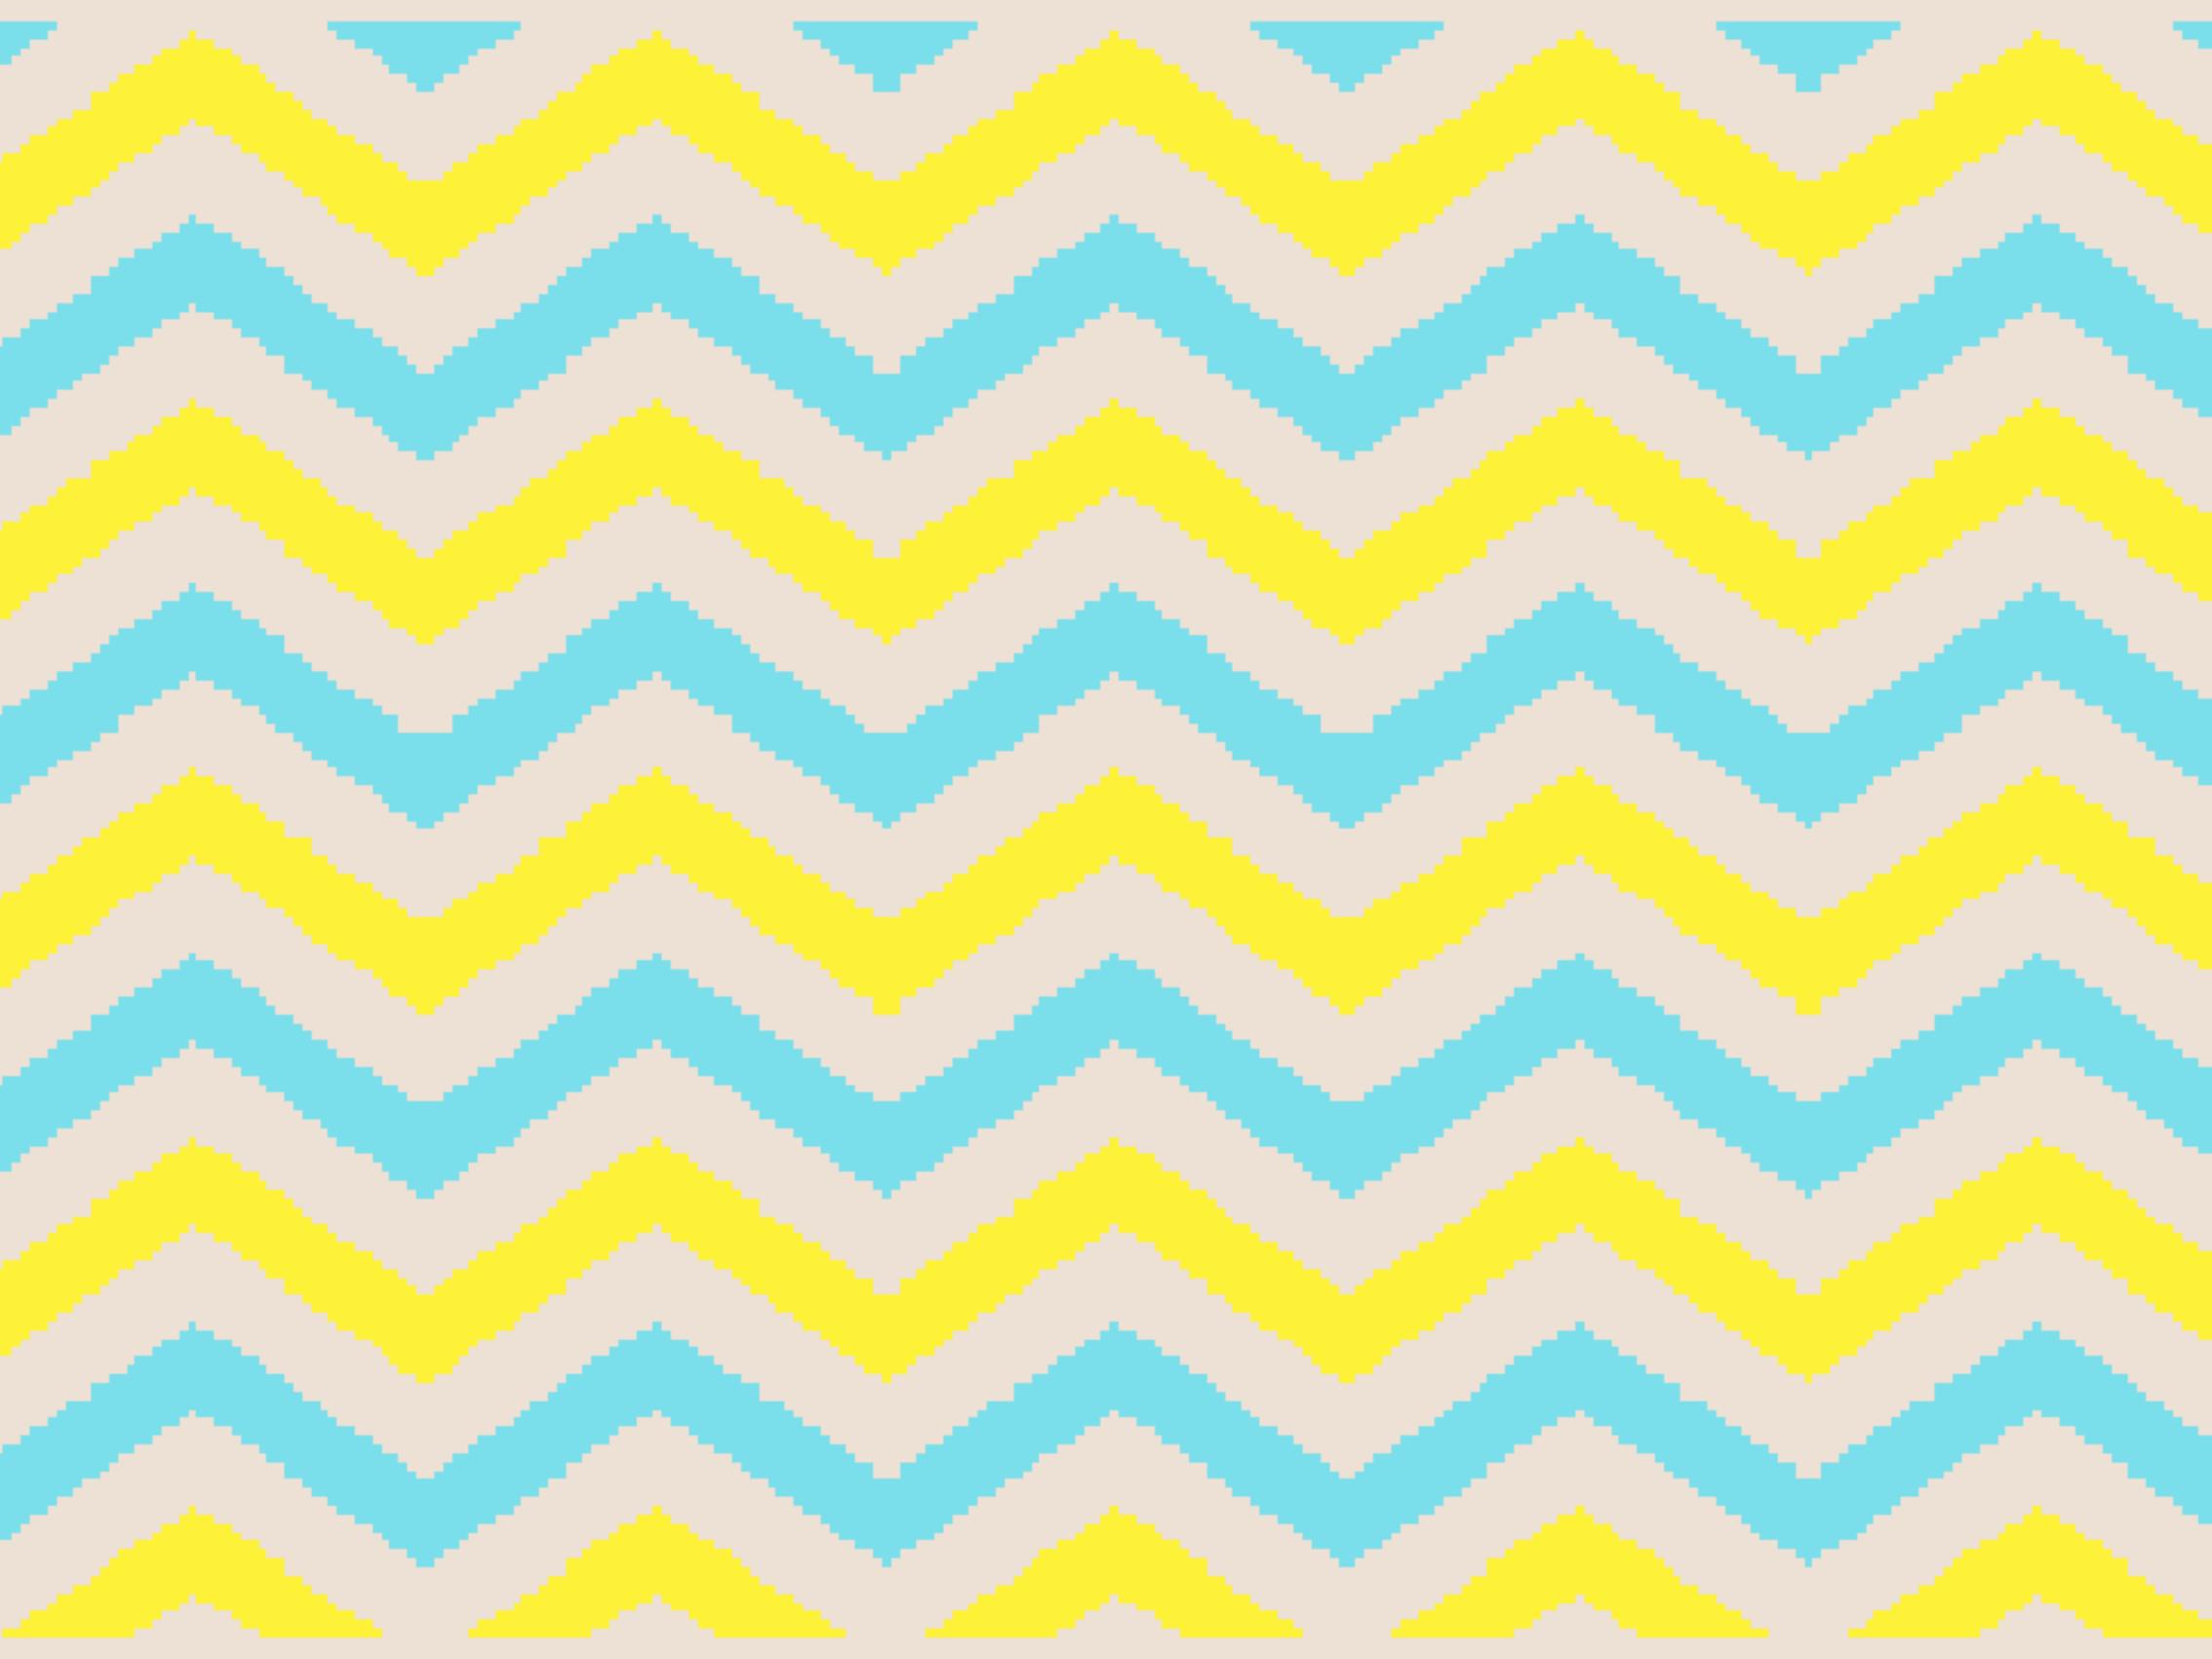 Summer wave pattern 999-K-111